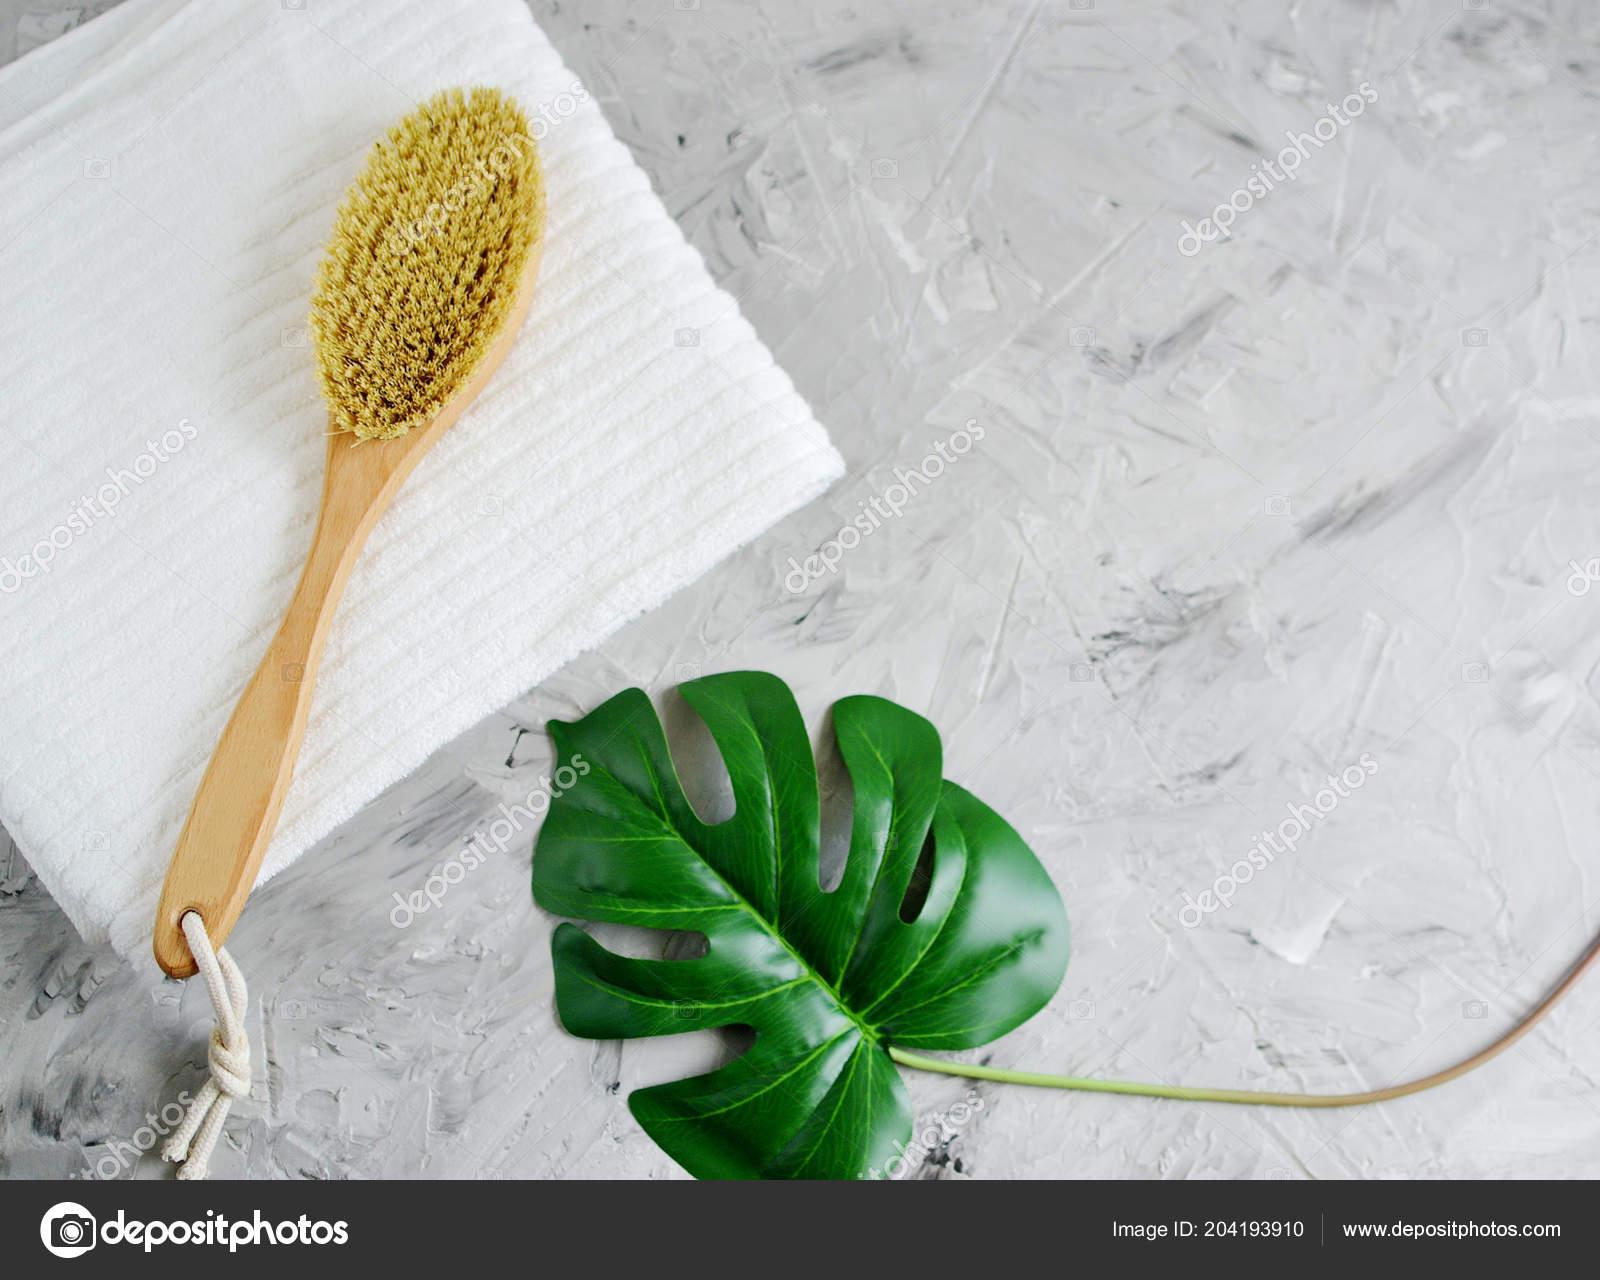 Natural Organic Wooden Body Massage Brush White Towel Home Spa